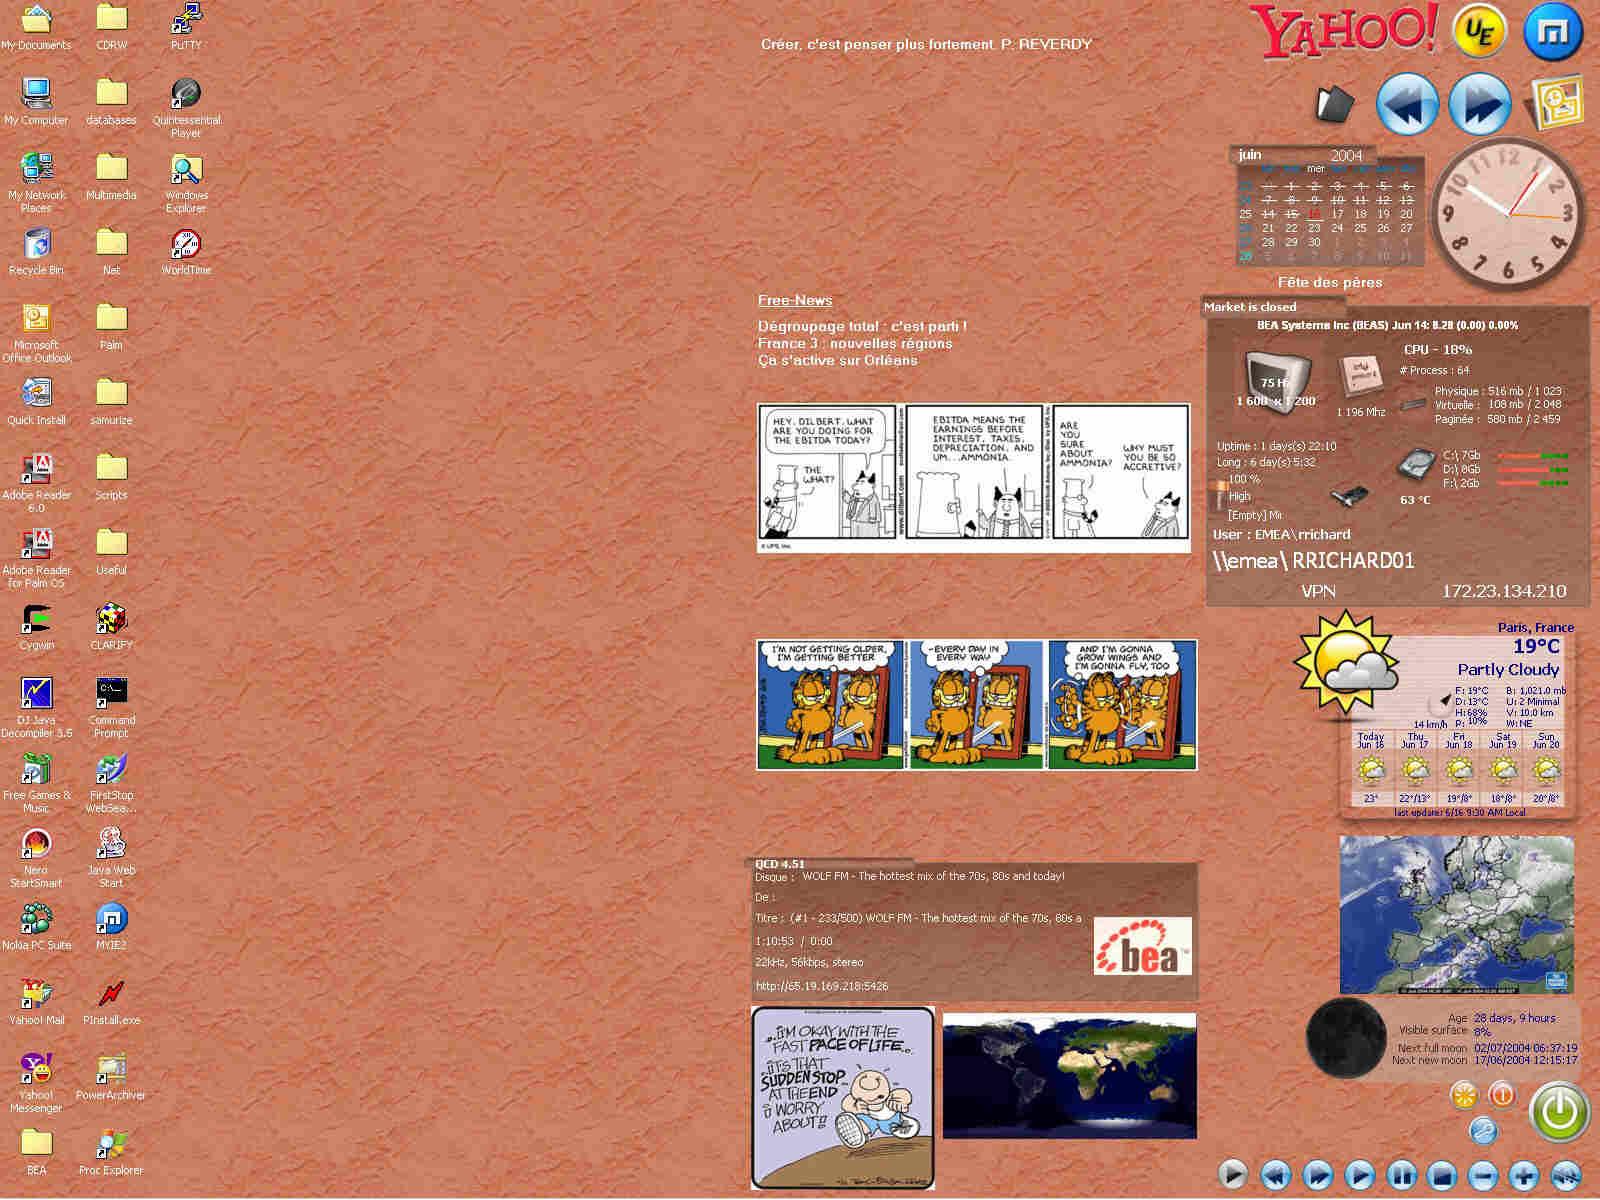 Title: My Work Laptop - 4 samurize instances